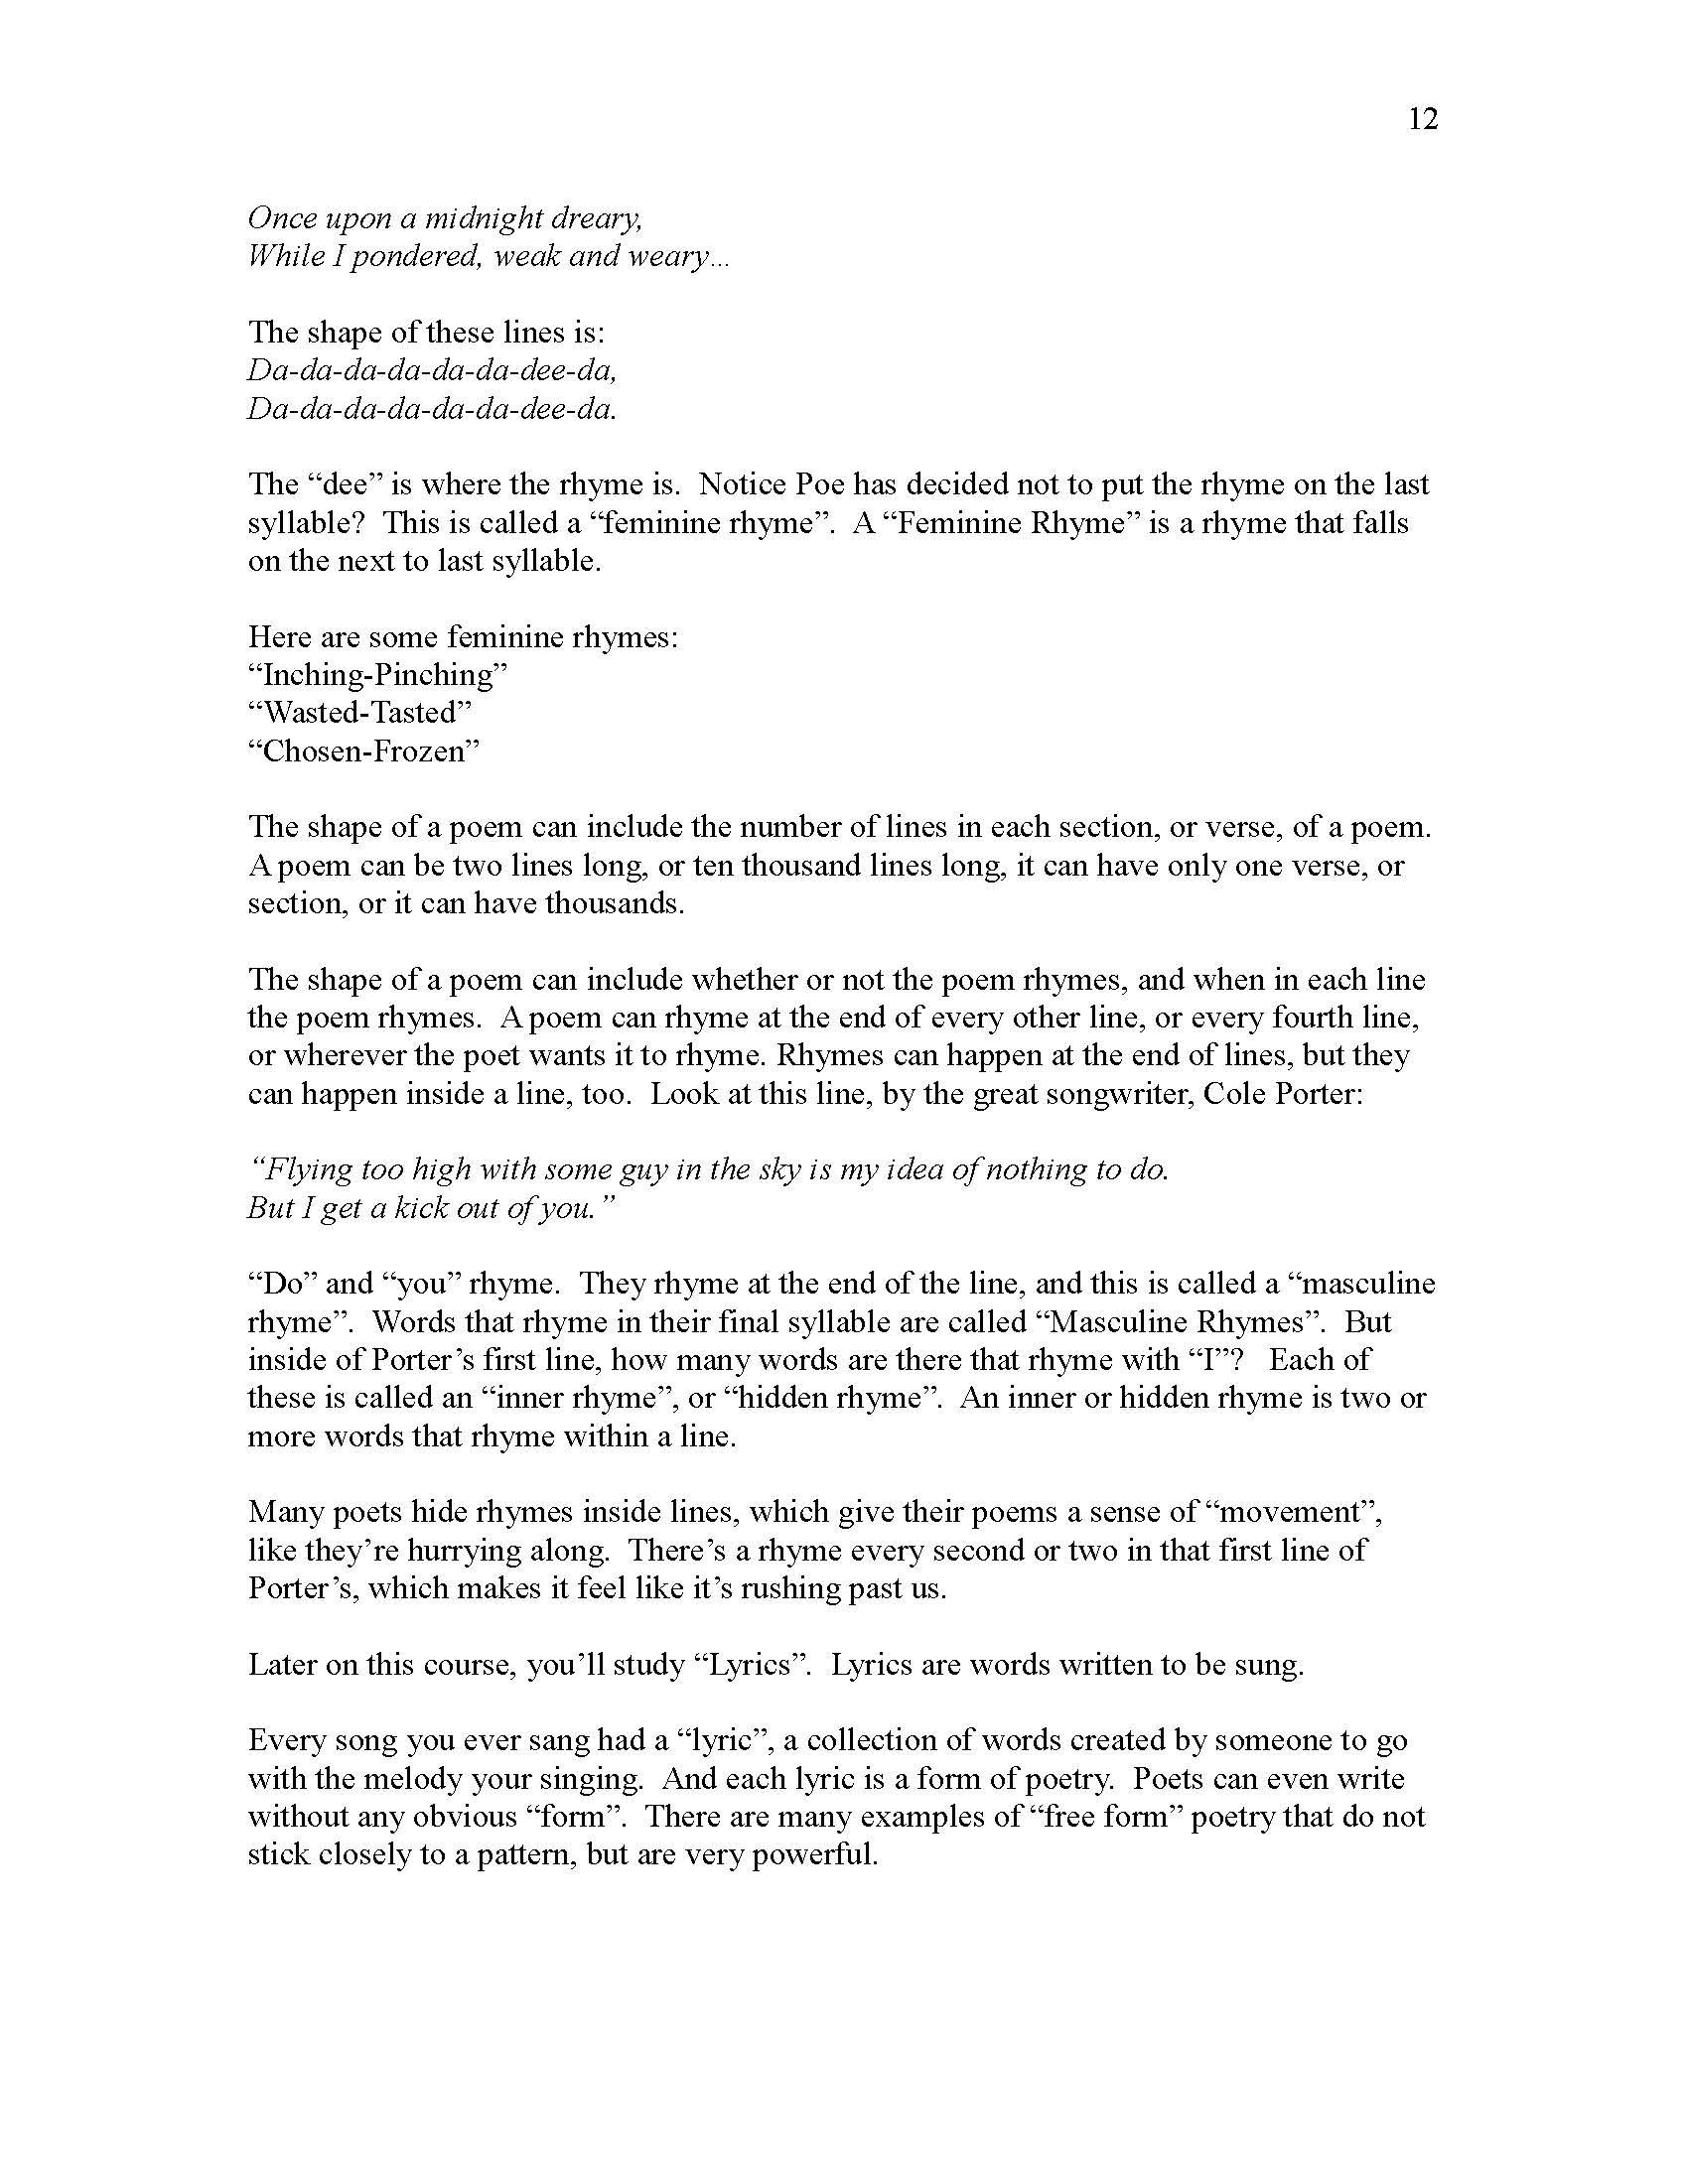 Step 4 Creative Writing 5 - The Field_Page_013.jpg